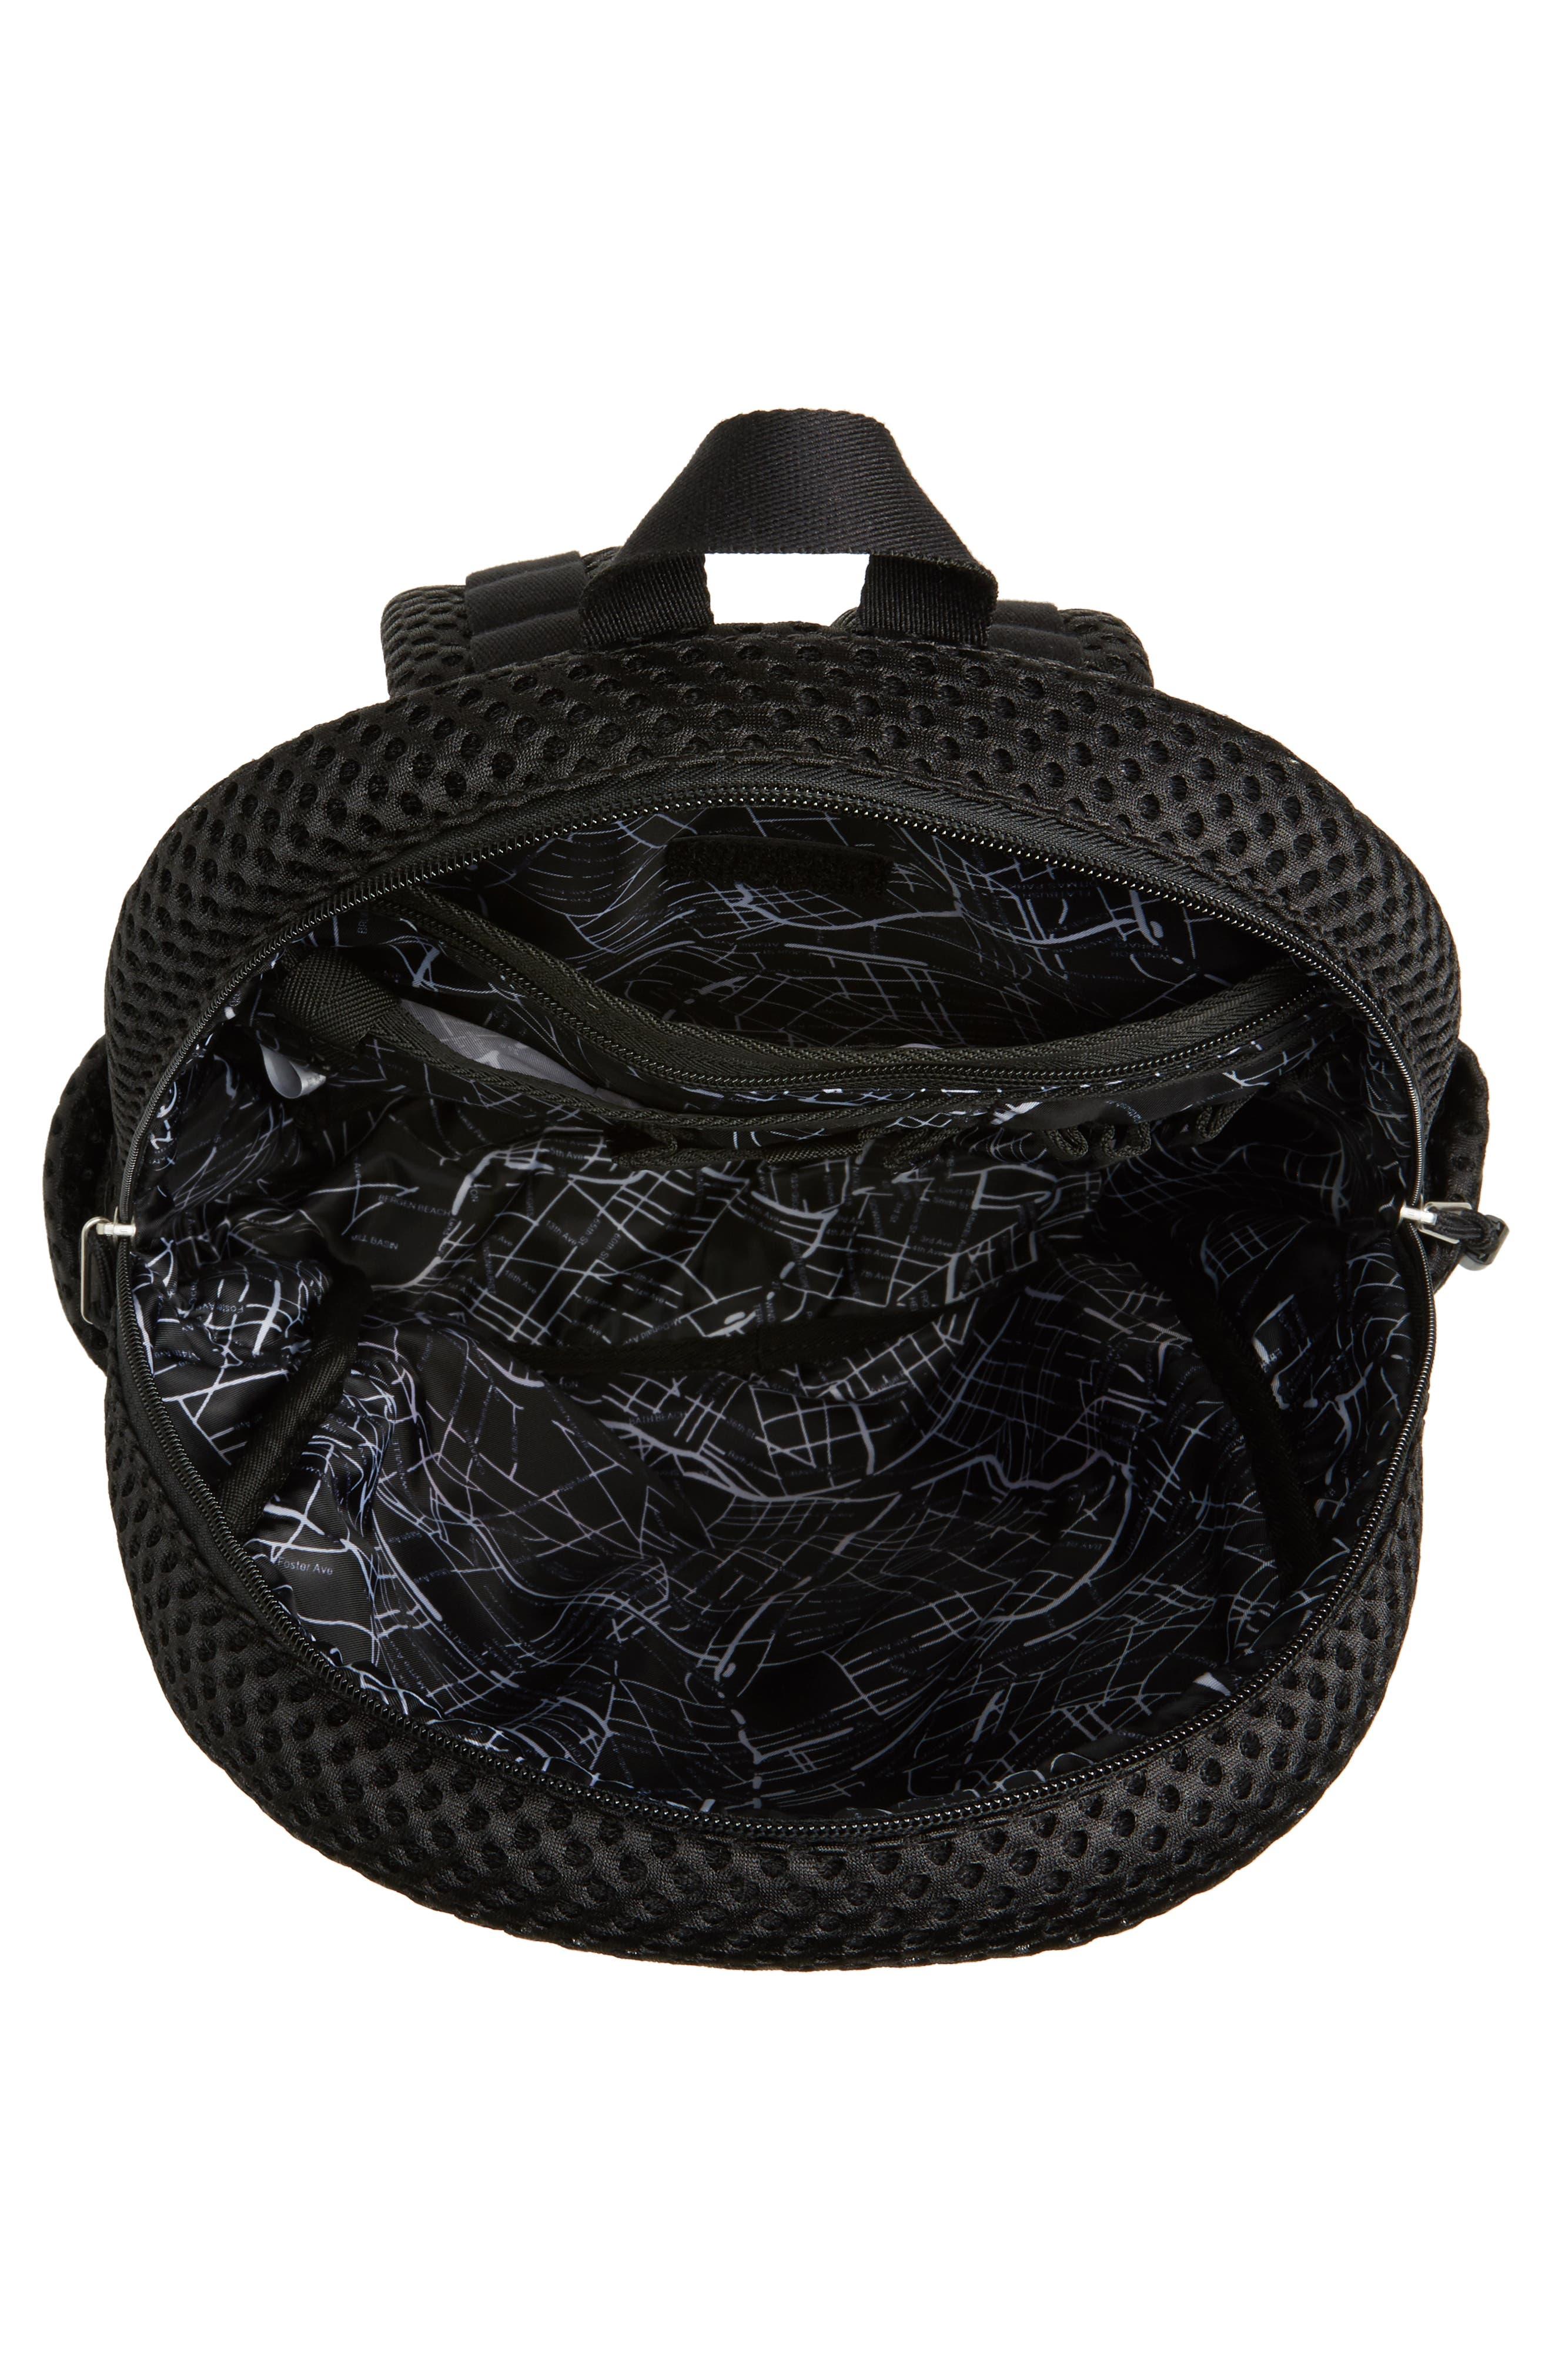 Lacrosse Mesh Kane Backpack,                             Alternate thumbnail 4, color,                             Black